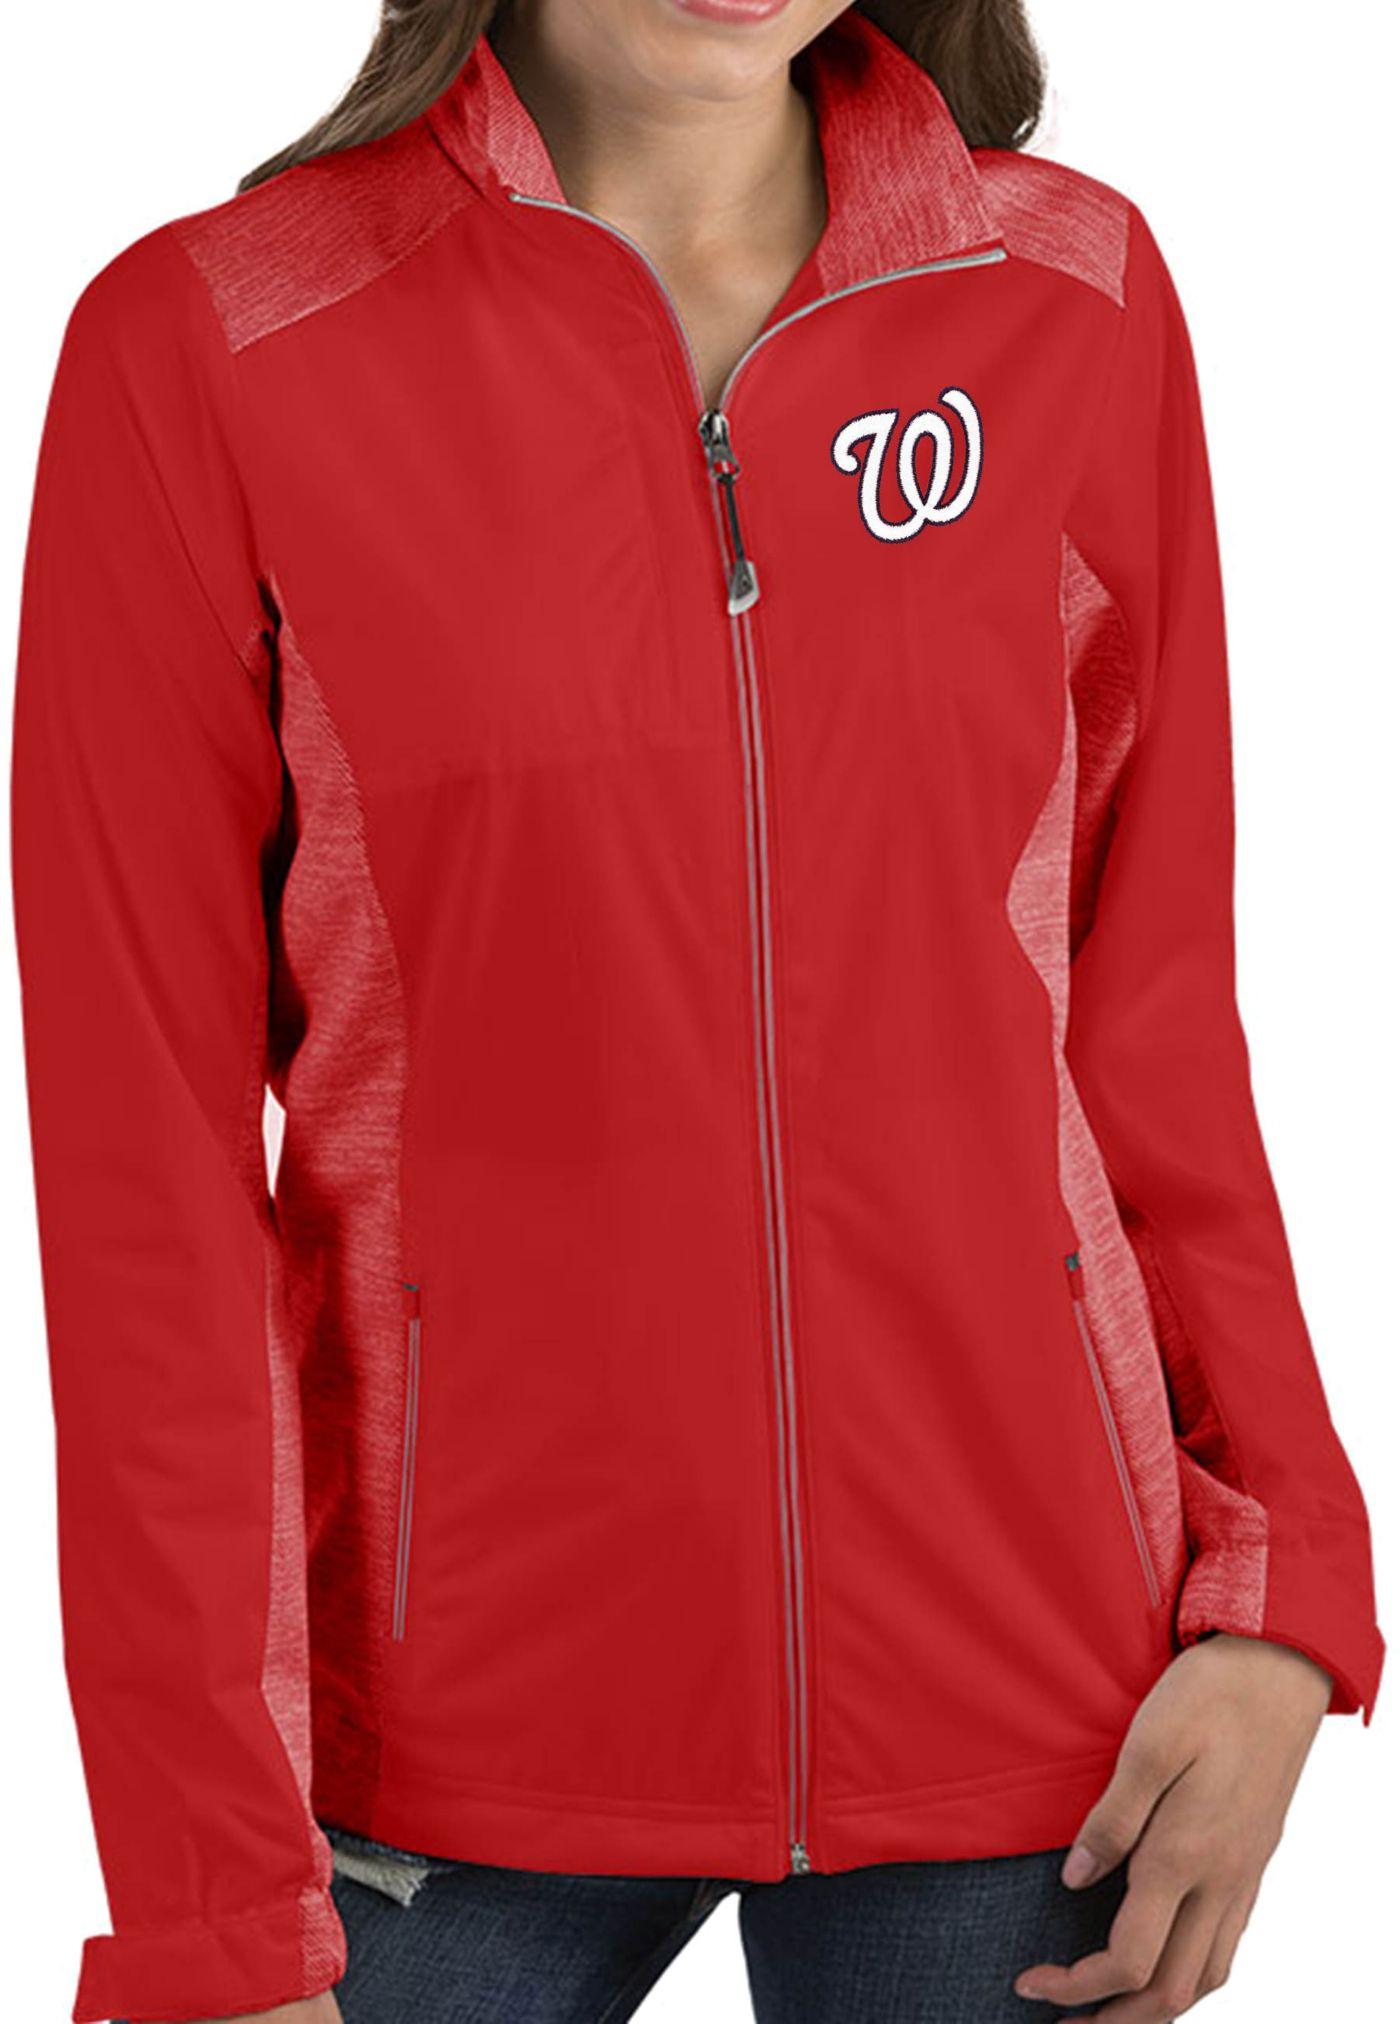 Antigua Women's Washington Nationals Revolve Red Full-Zip Jacket